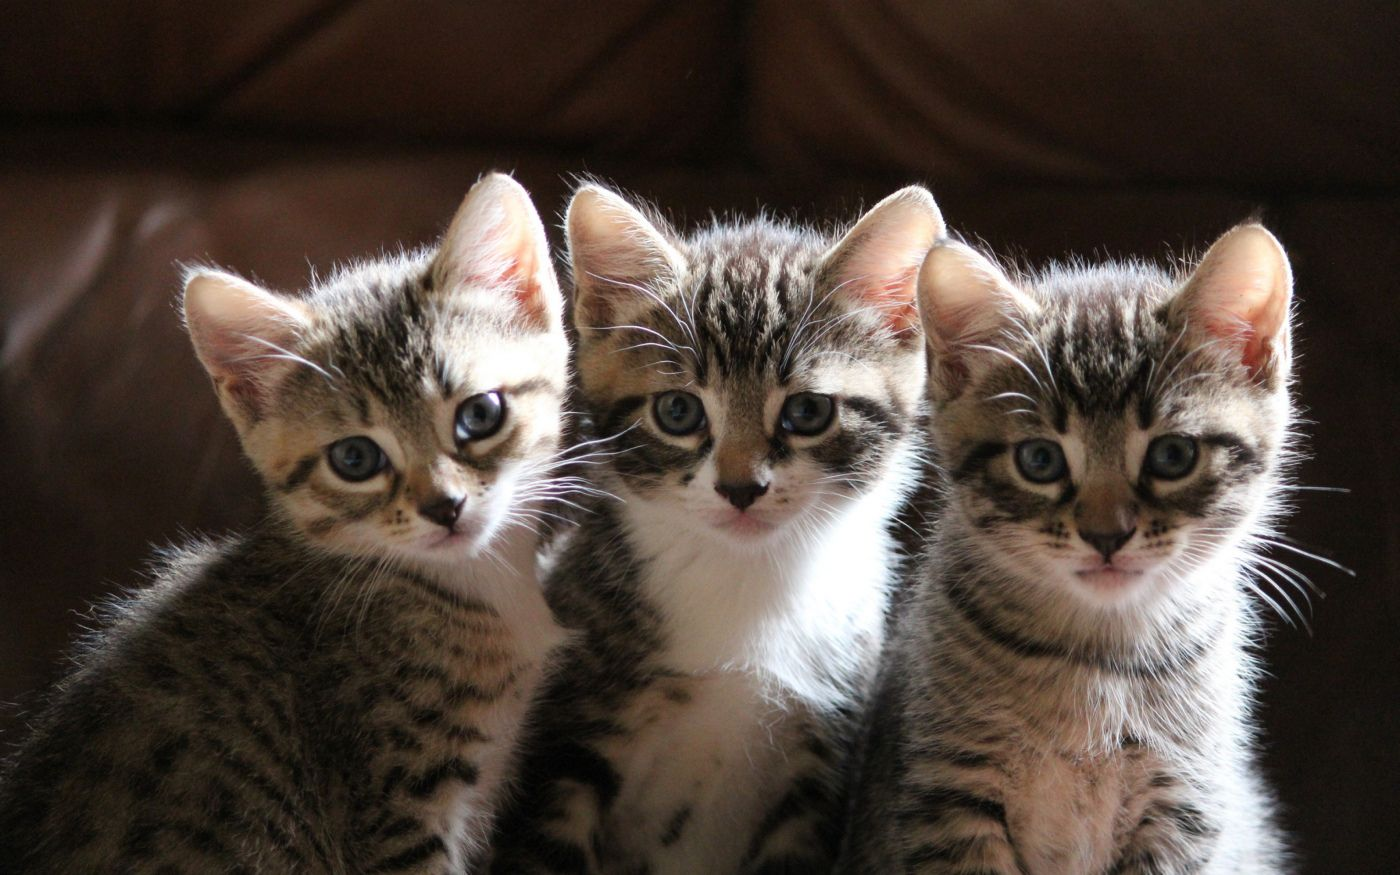 Groups Of Three Kittens Cutest Cats Kittens Cute Kitten Gif